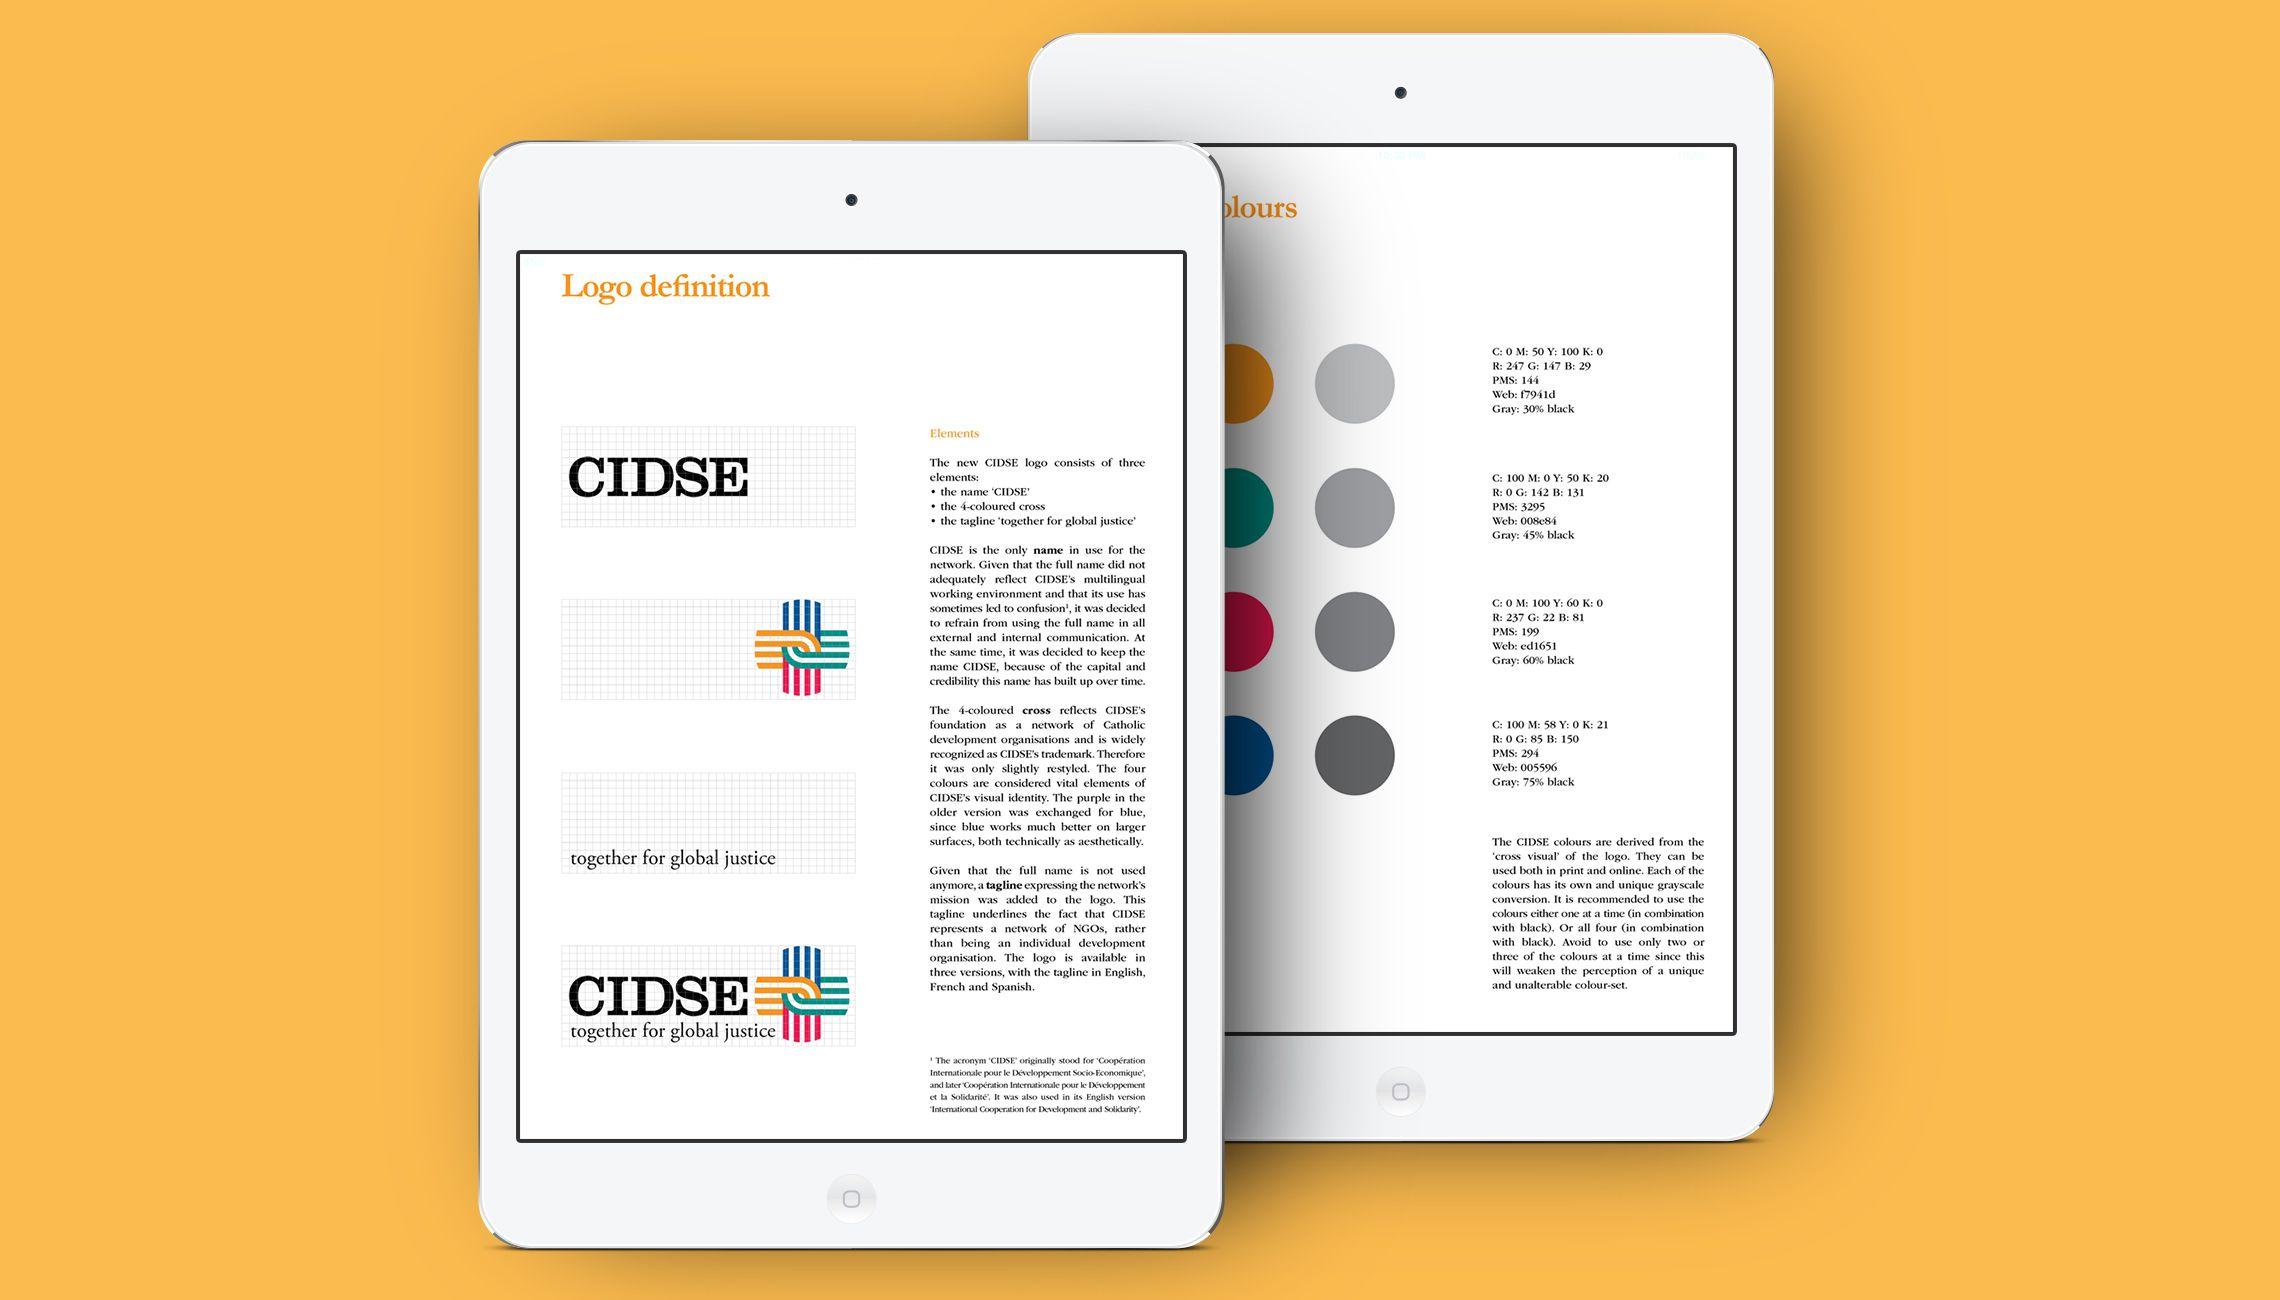 identity: CIDSE Identity design - image 3